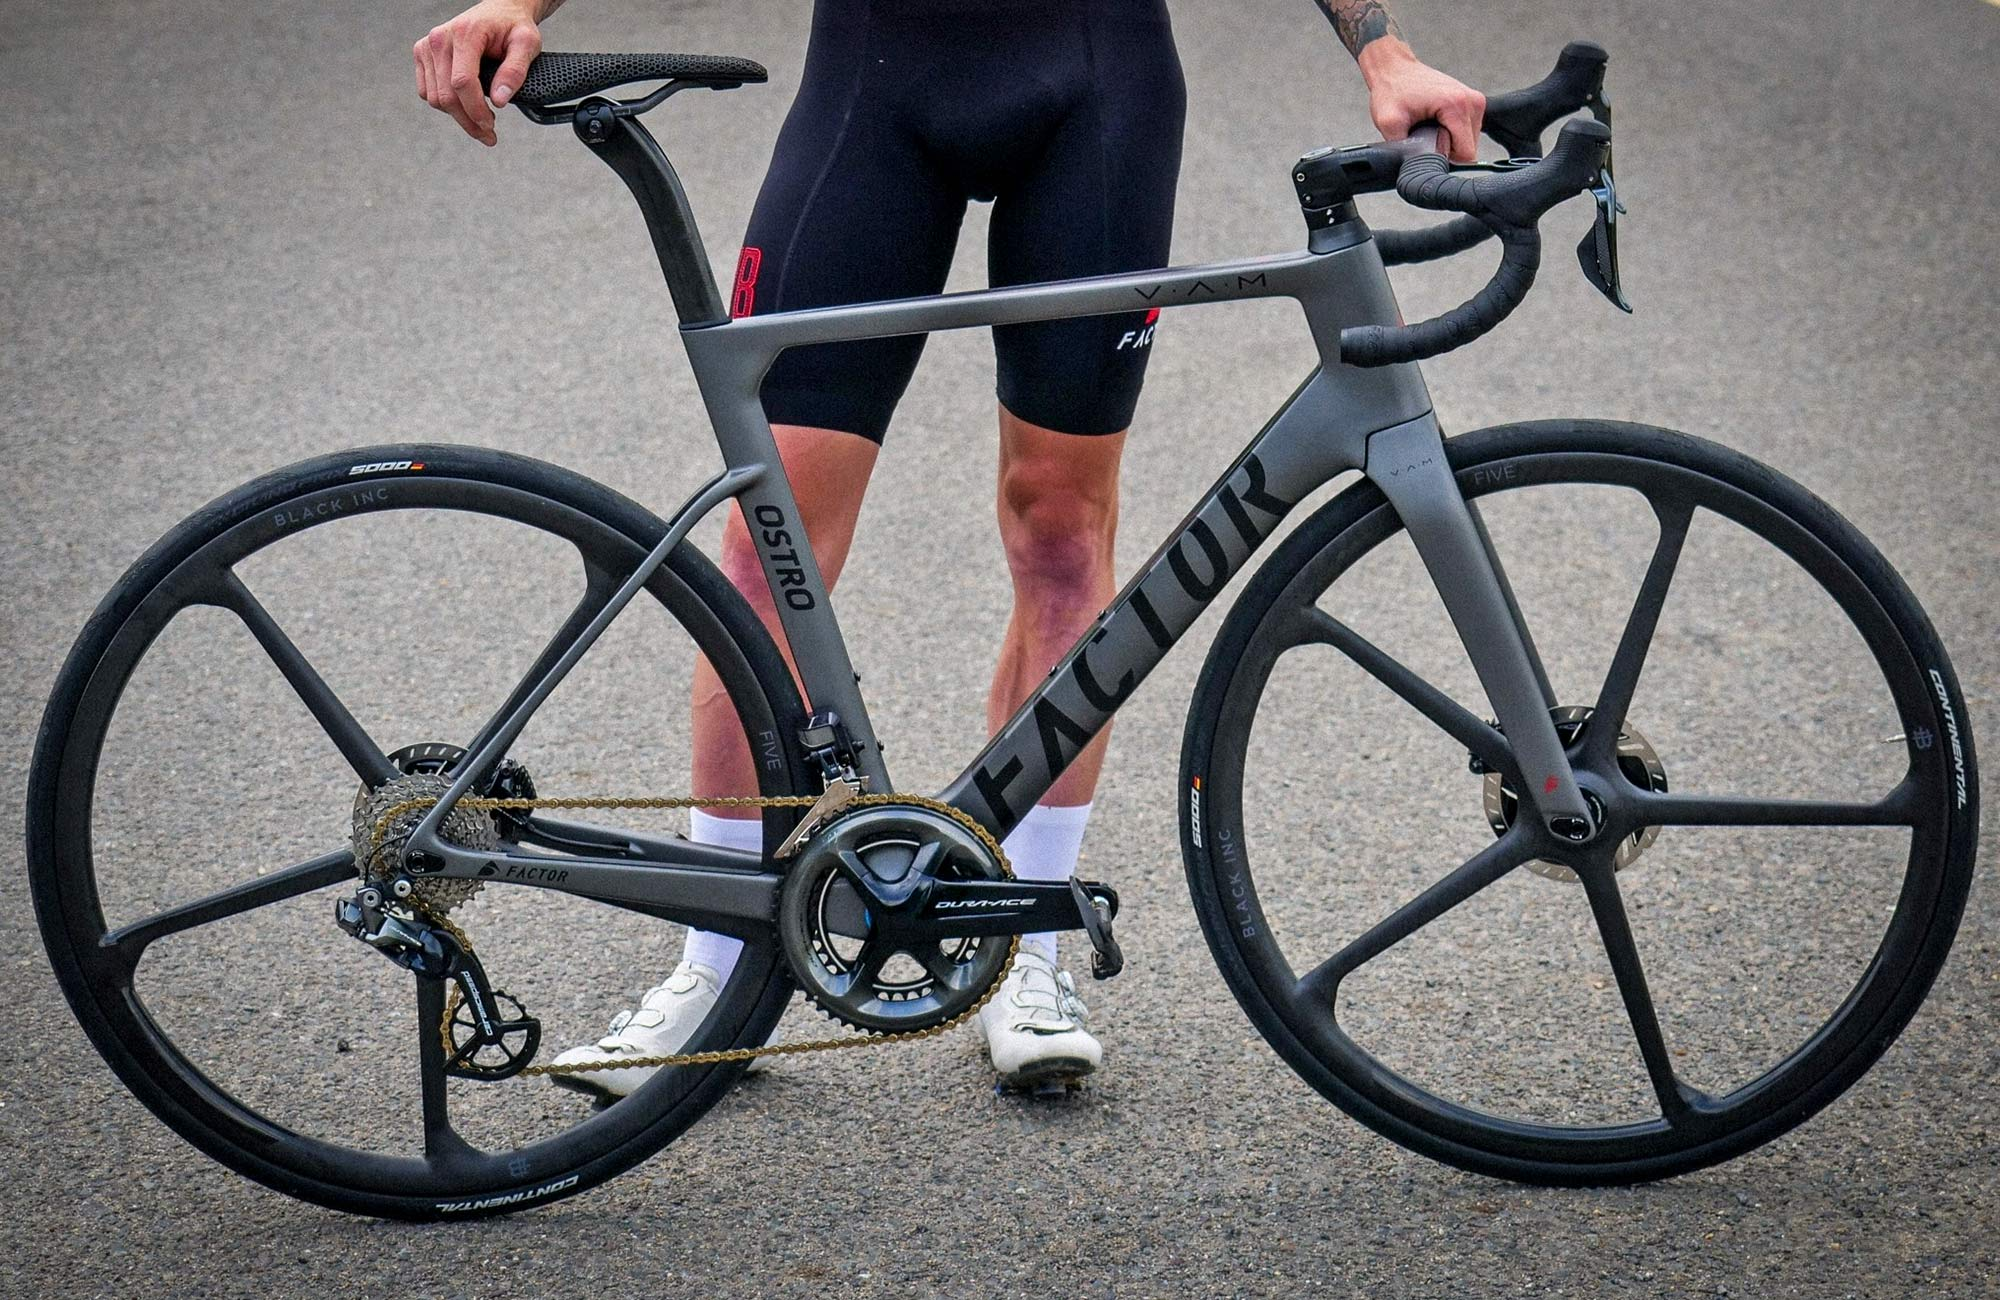 Black Inc FIVE aero carbon 5-spoke tubeless disc brake road bike wheels,complete bike